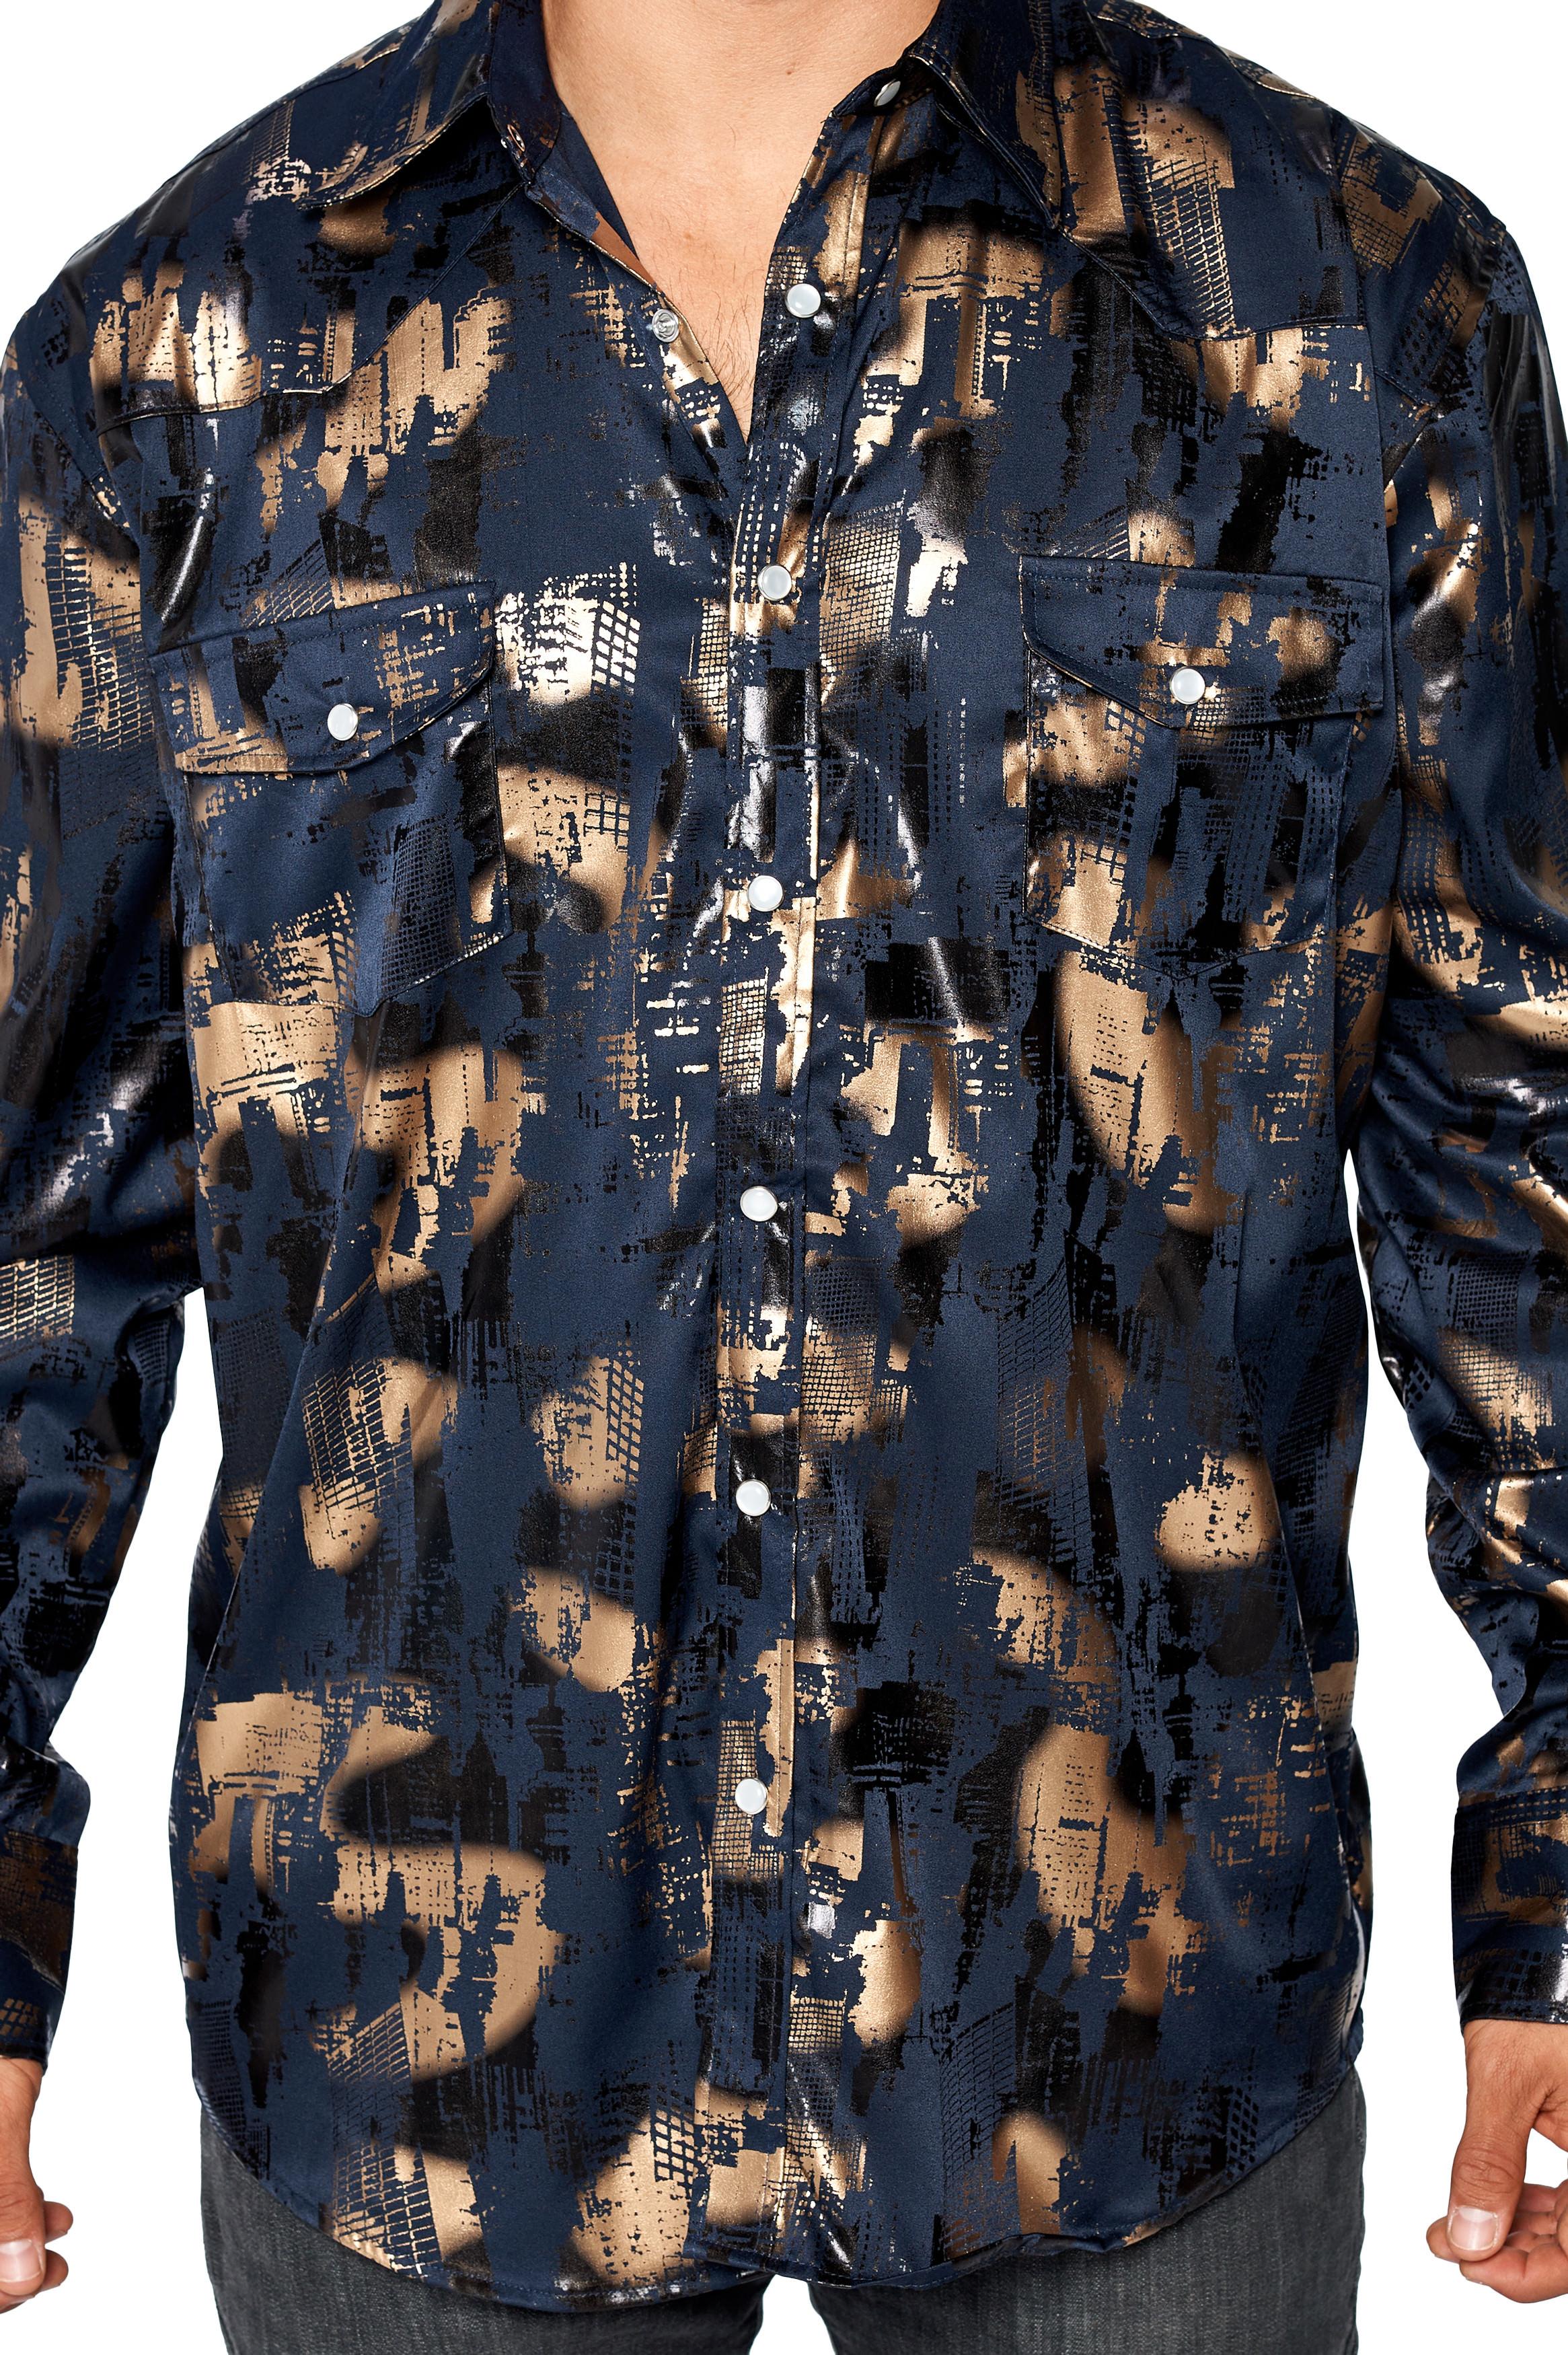 LW-Men-039-s-Pearl-Snap-Tribal-Stylish-Printed-Woven-Western-Vaquero-Rodeo-Shirt thumbnail 24